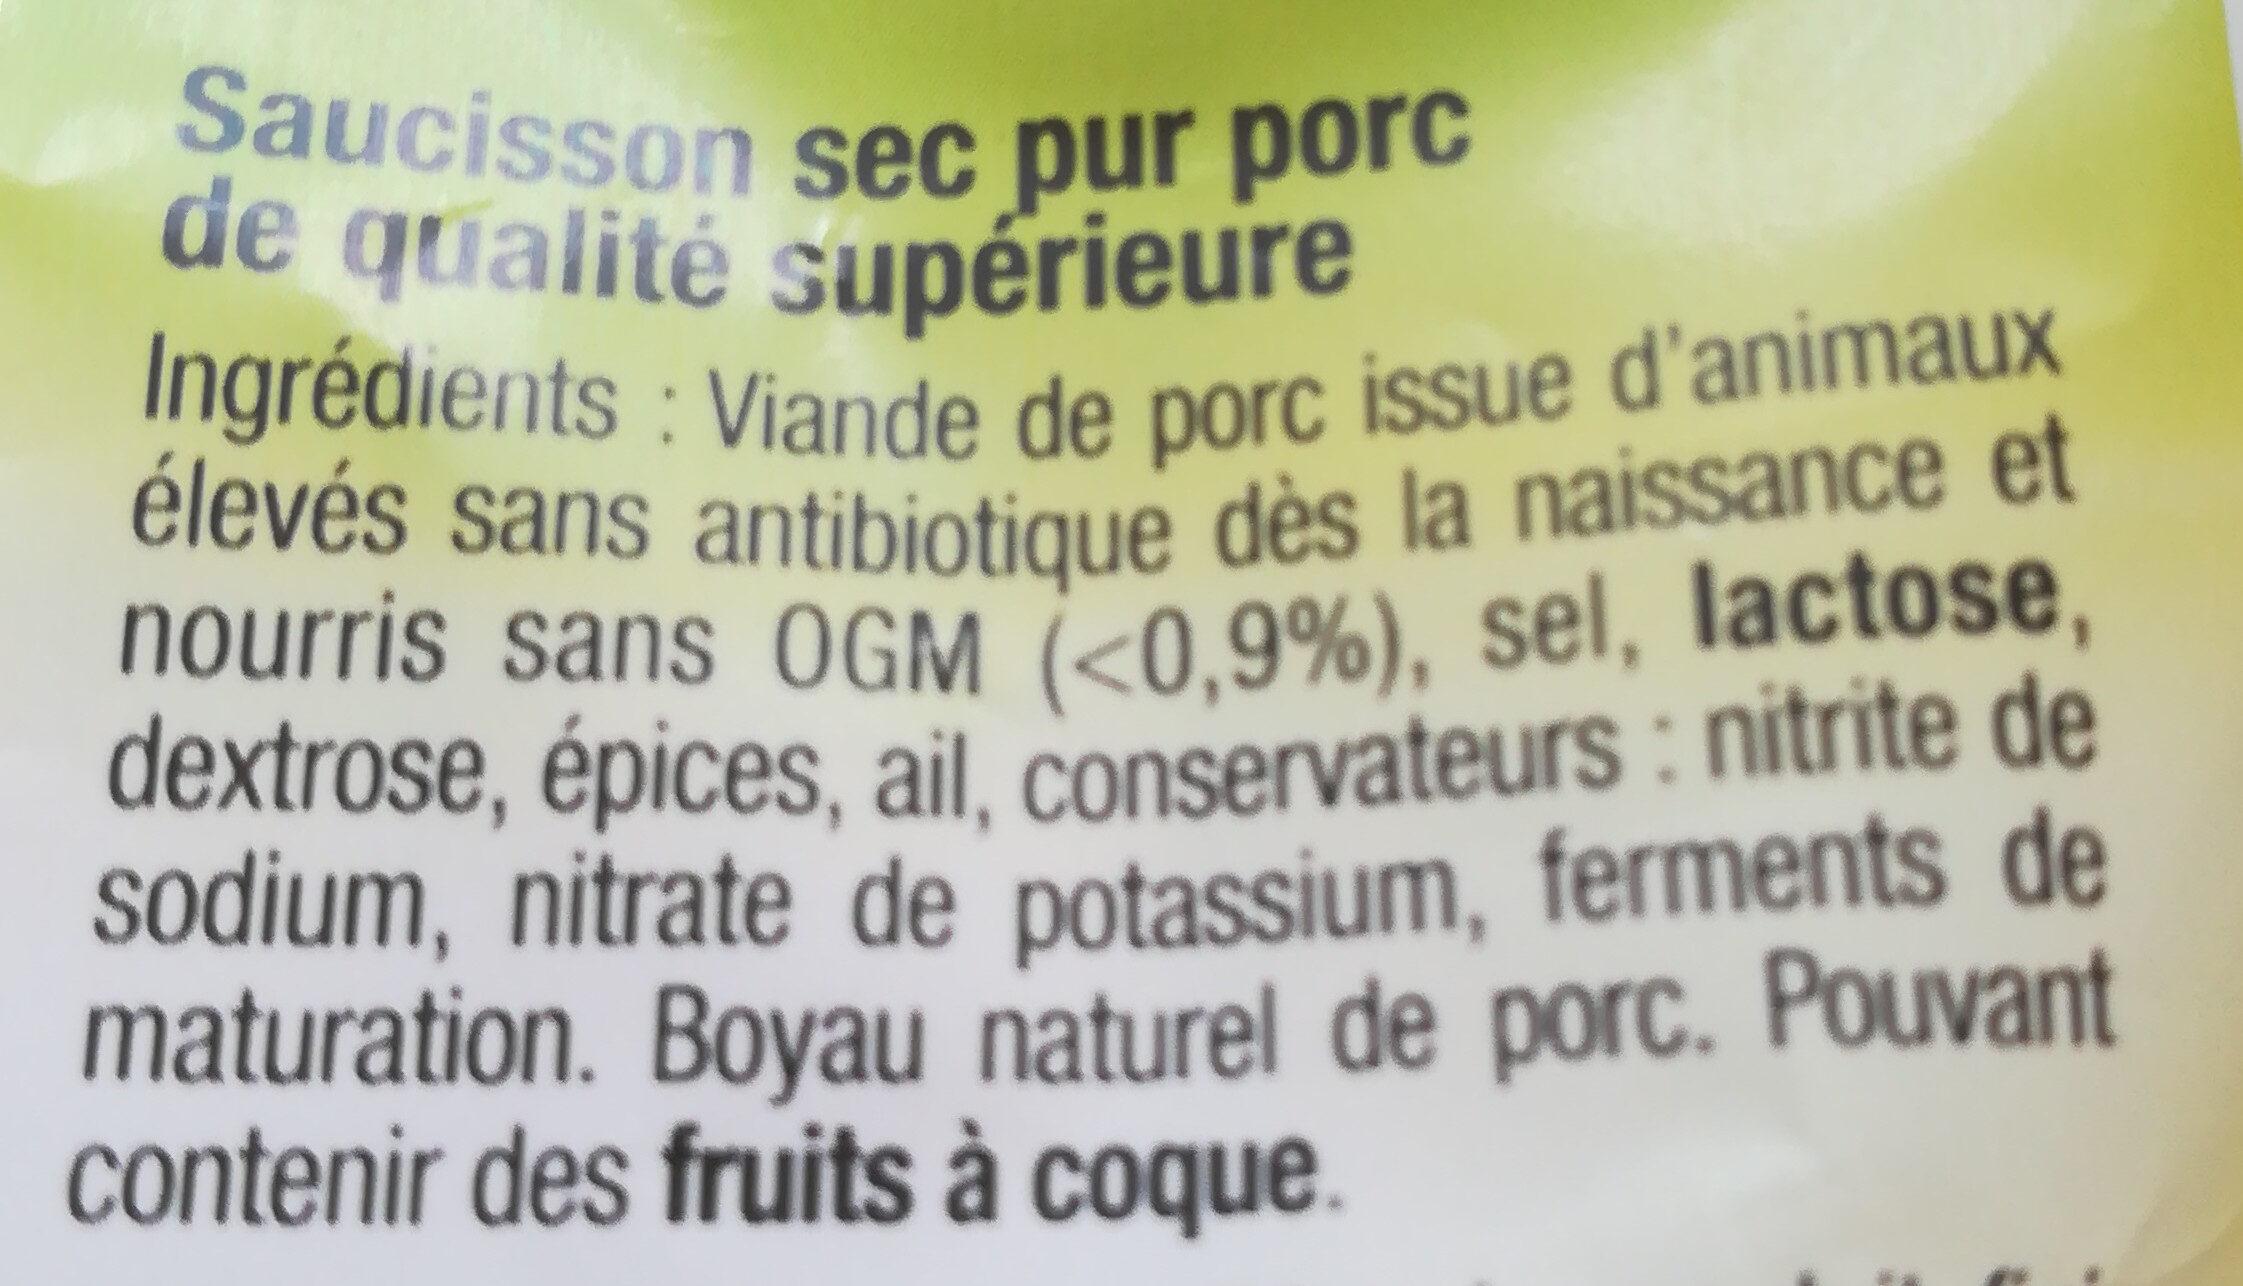 Saucisson sec - Ingredients